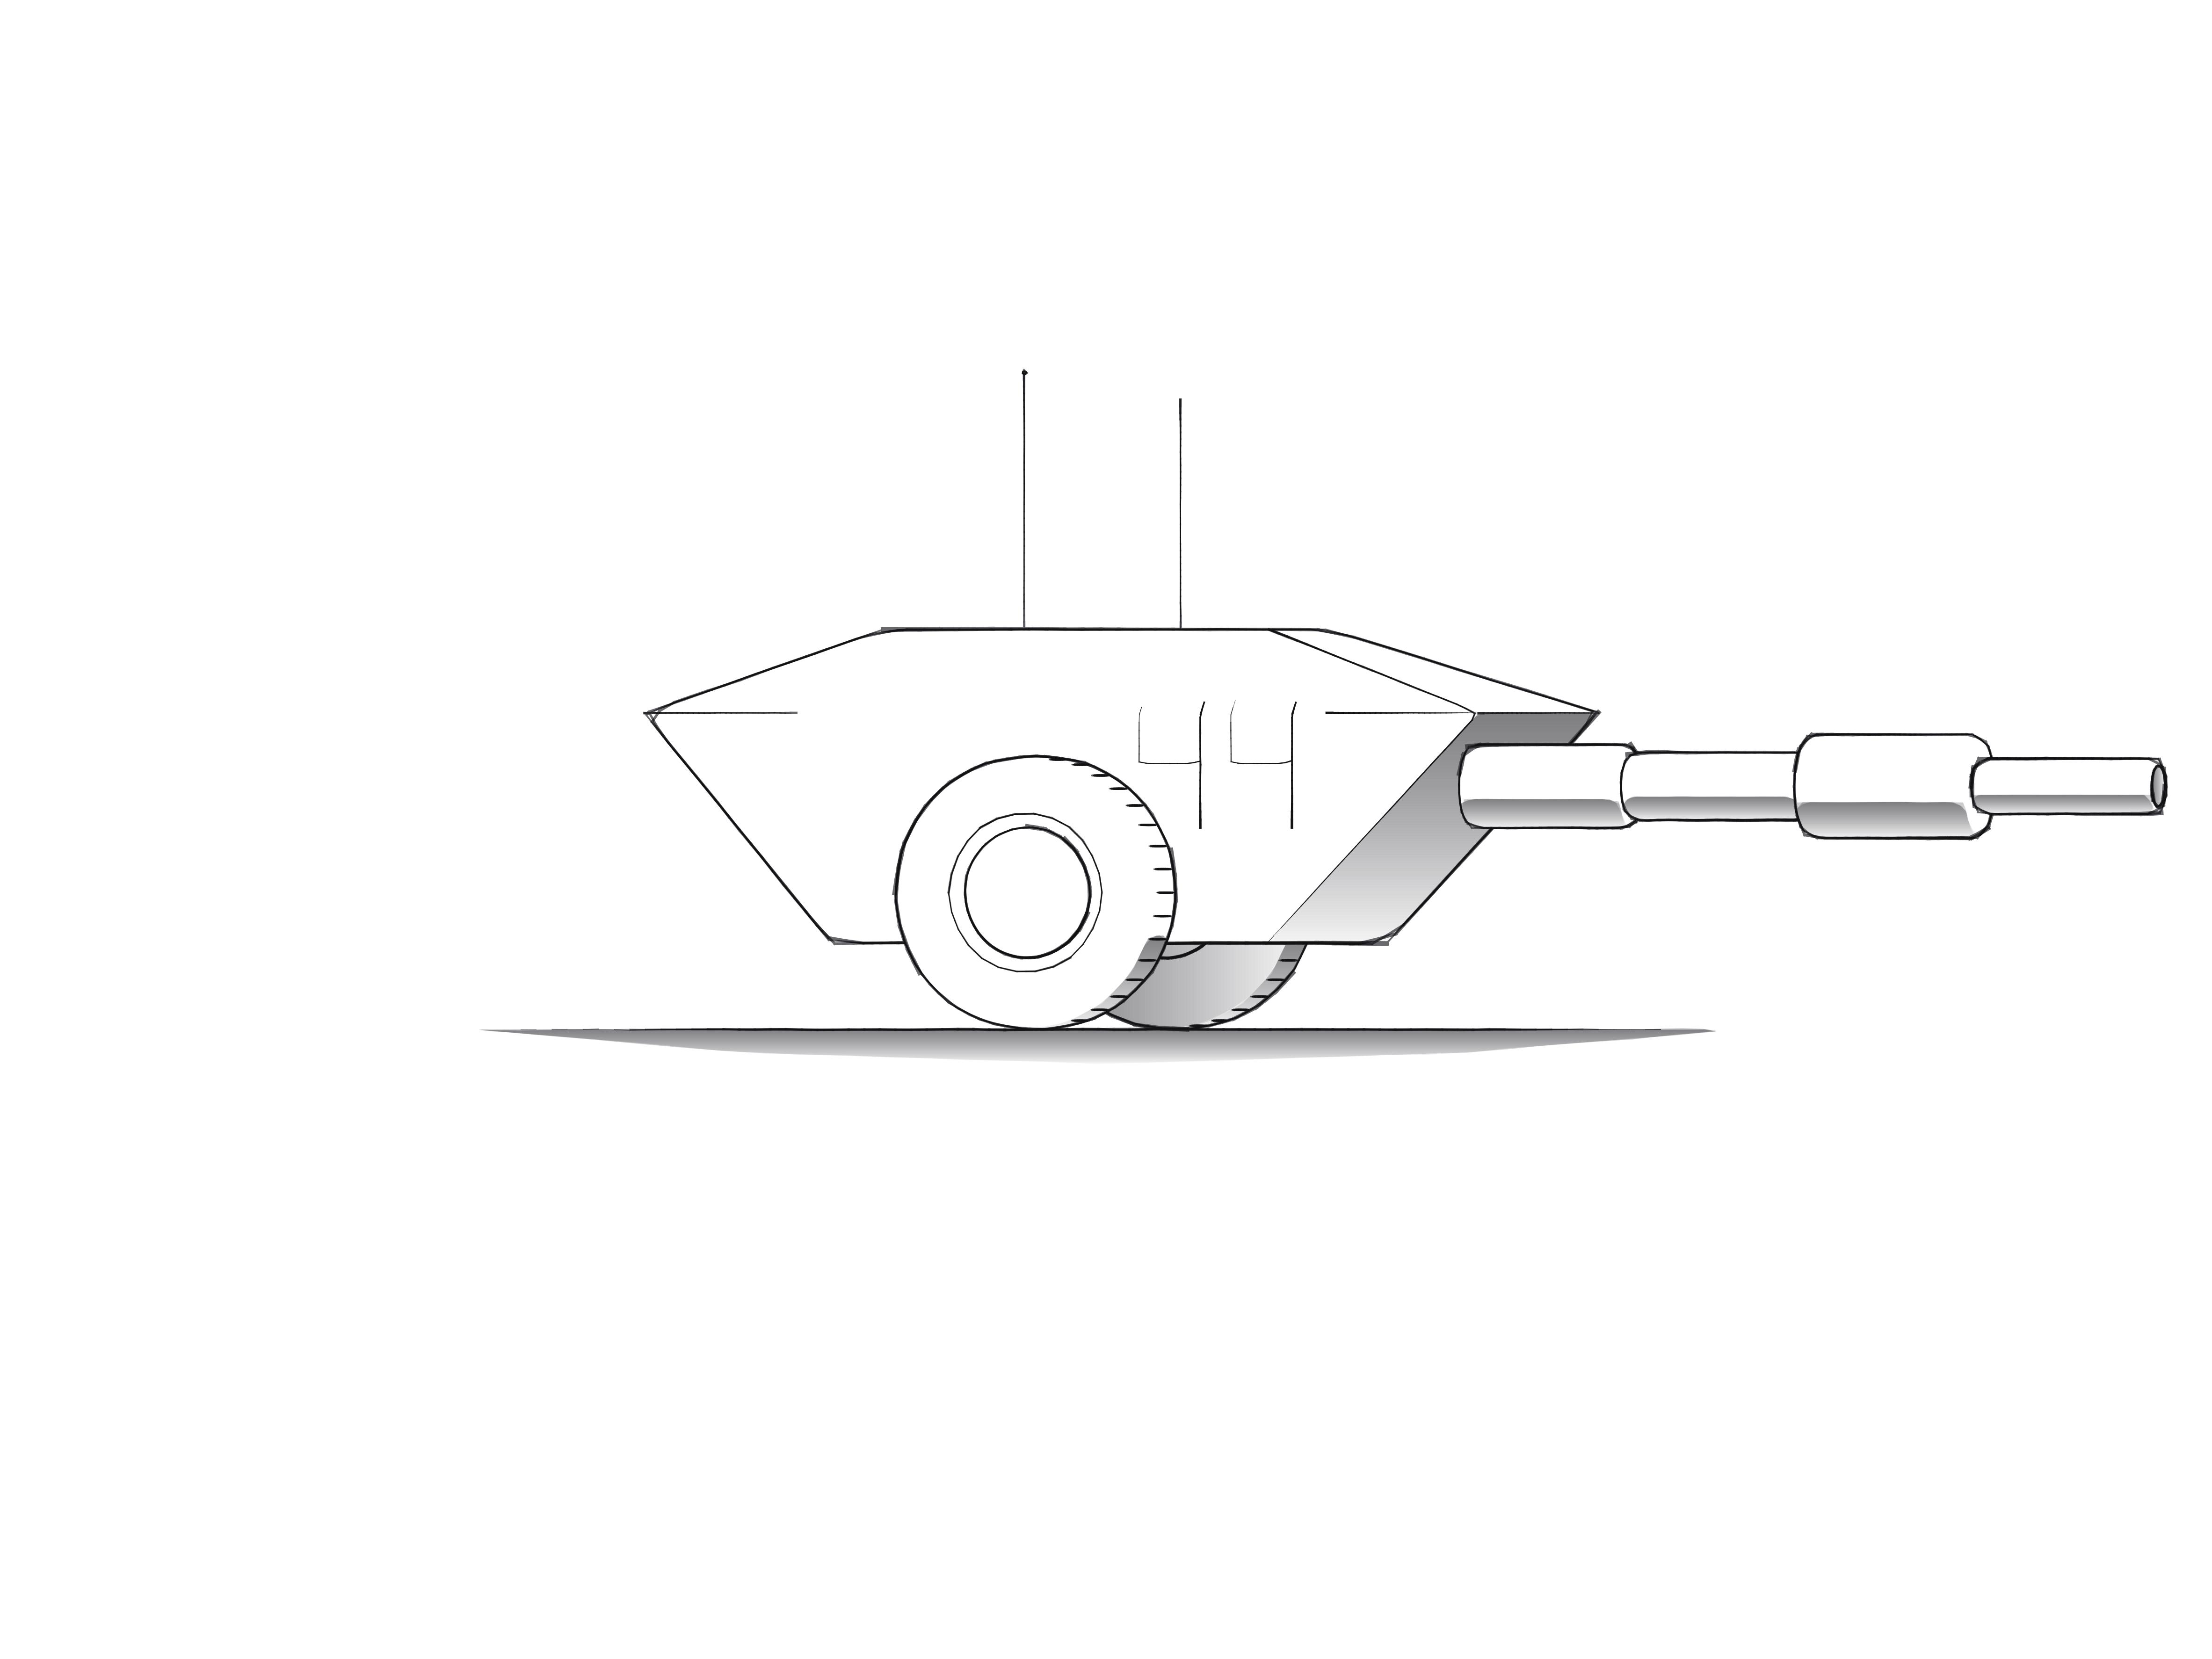 One of the randomly generated Tanks.